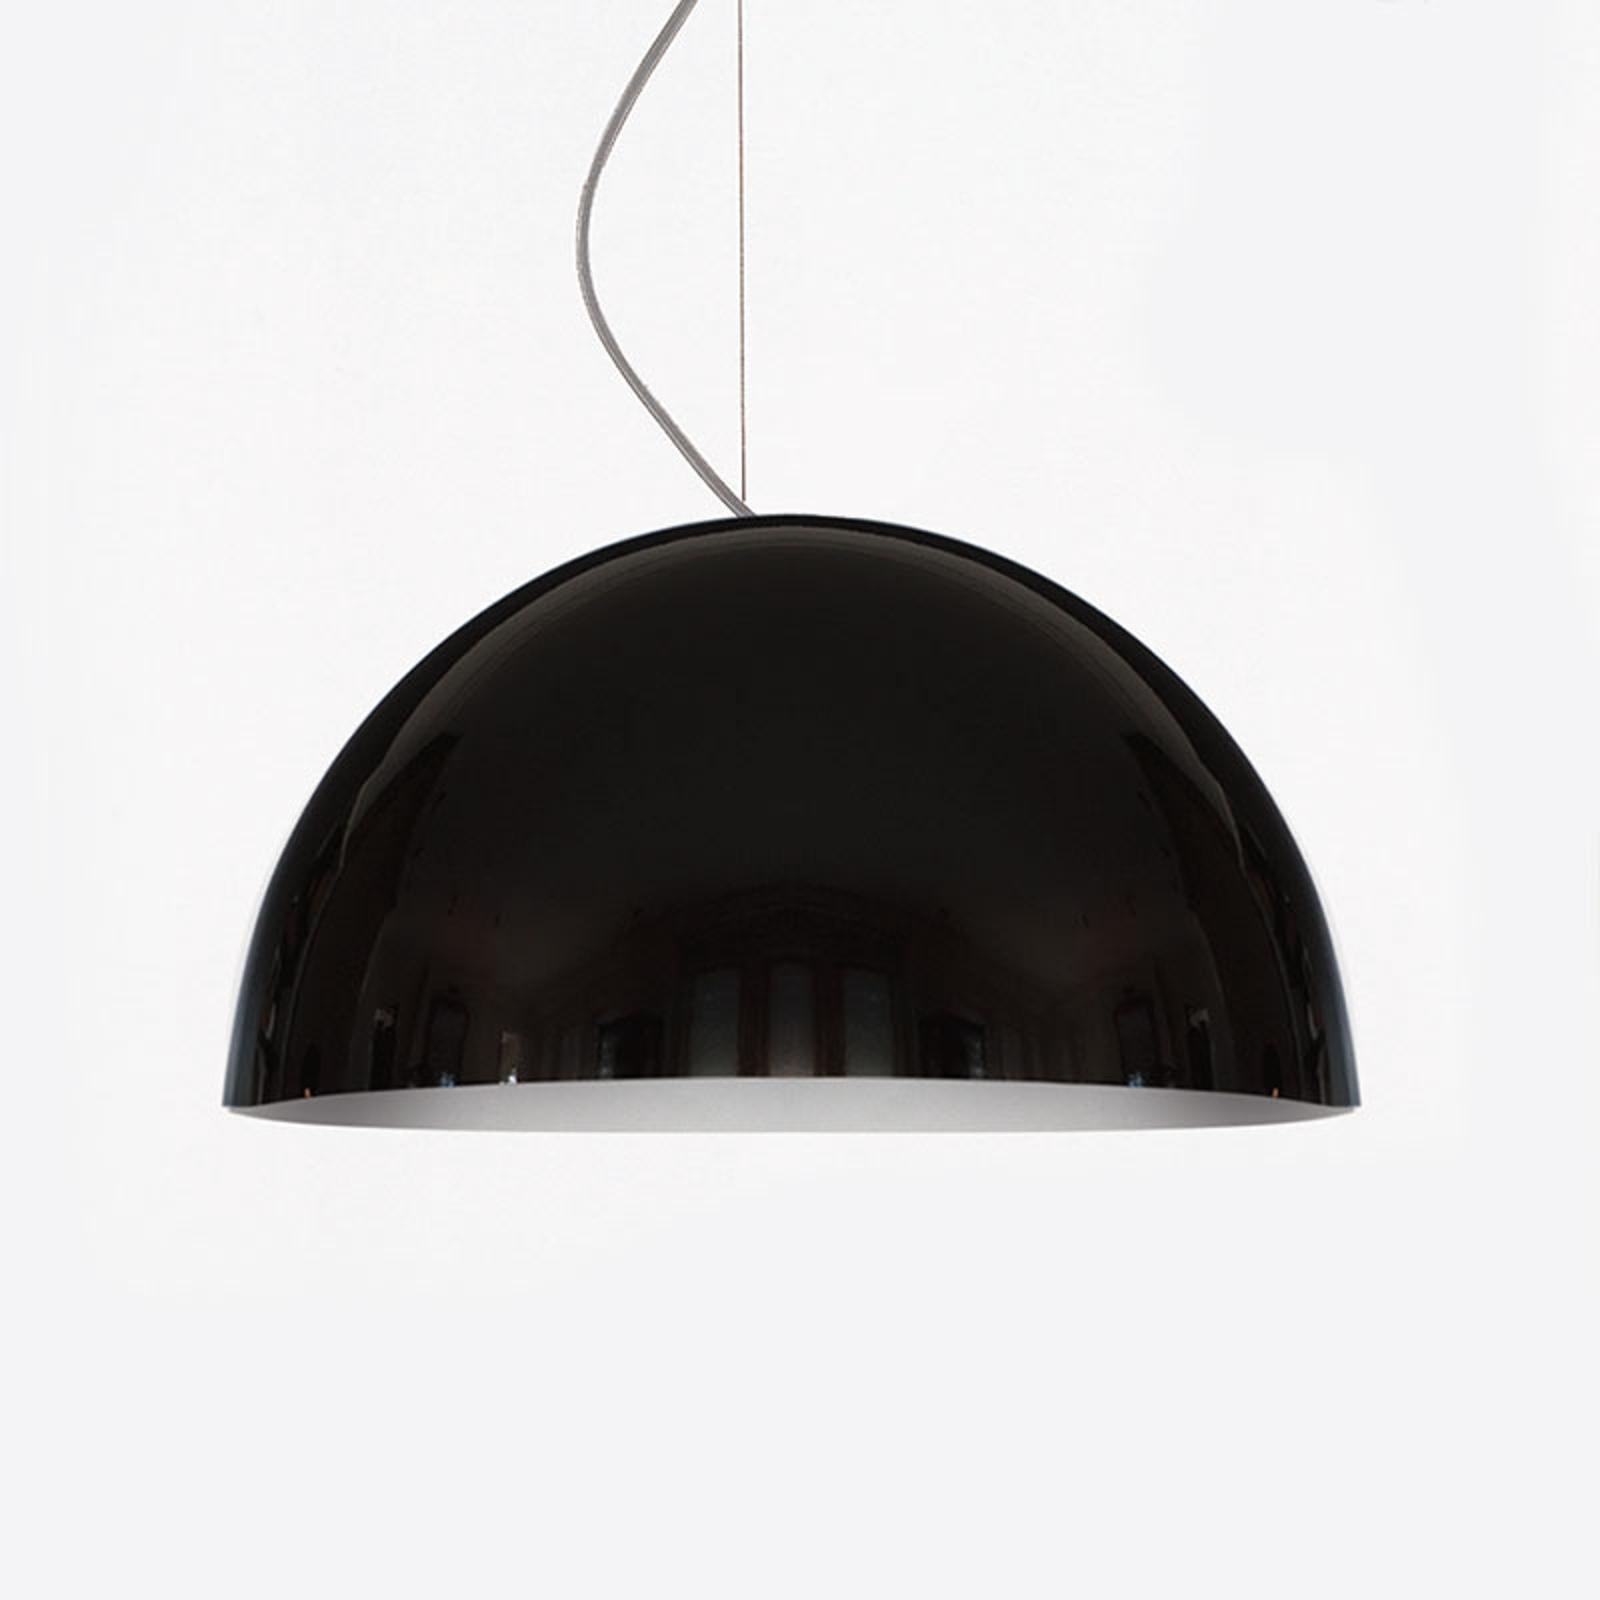 Oluce Sonora - svart hengelampe, 38 cm